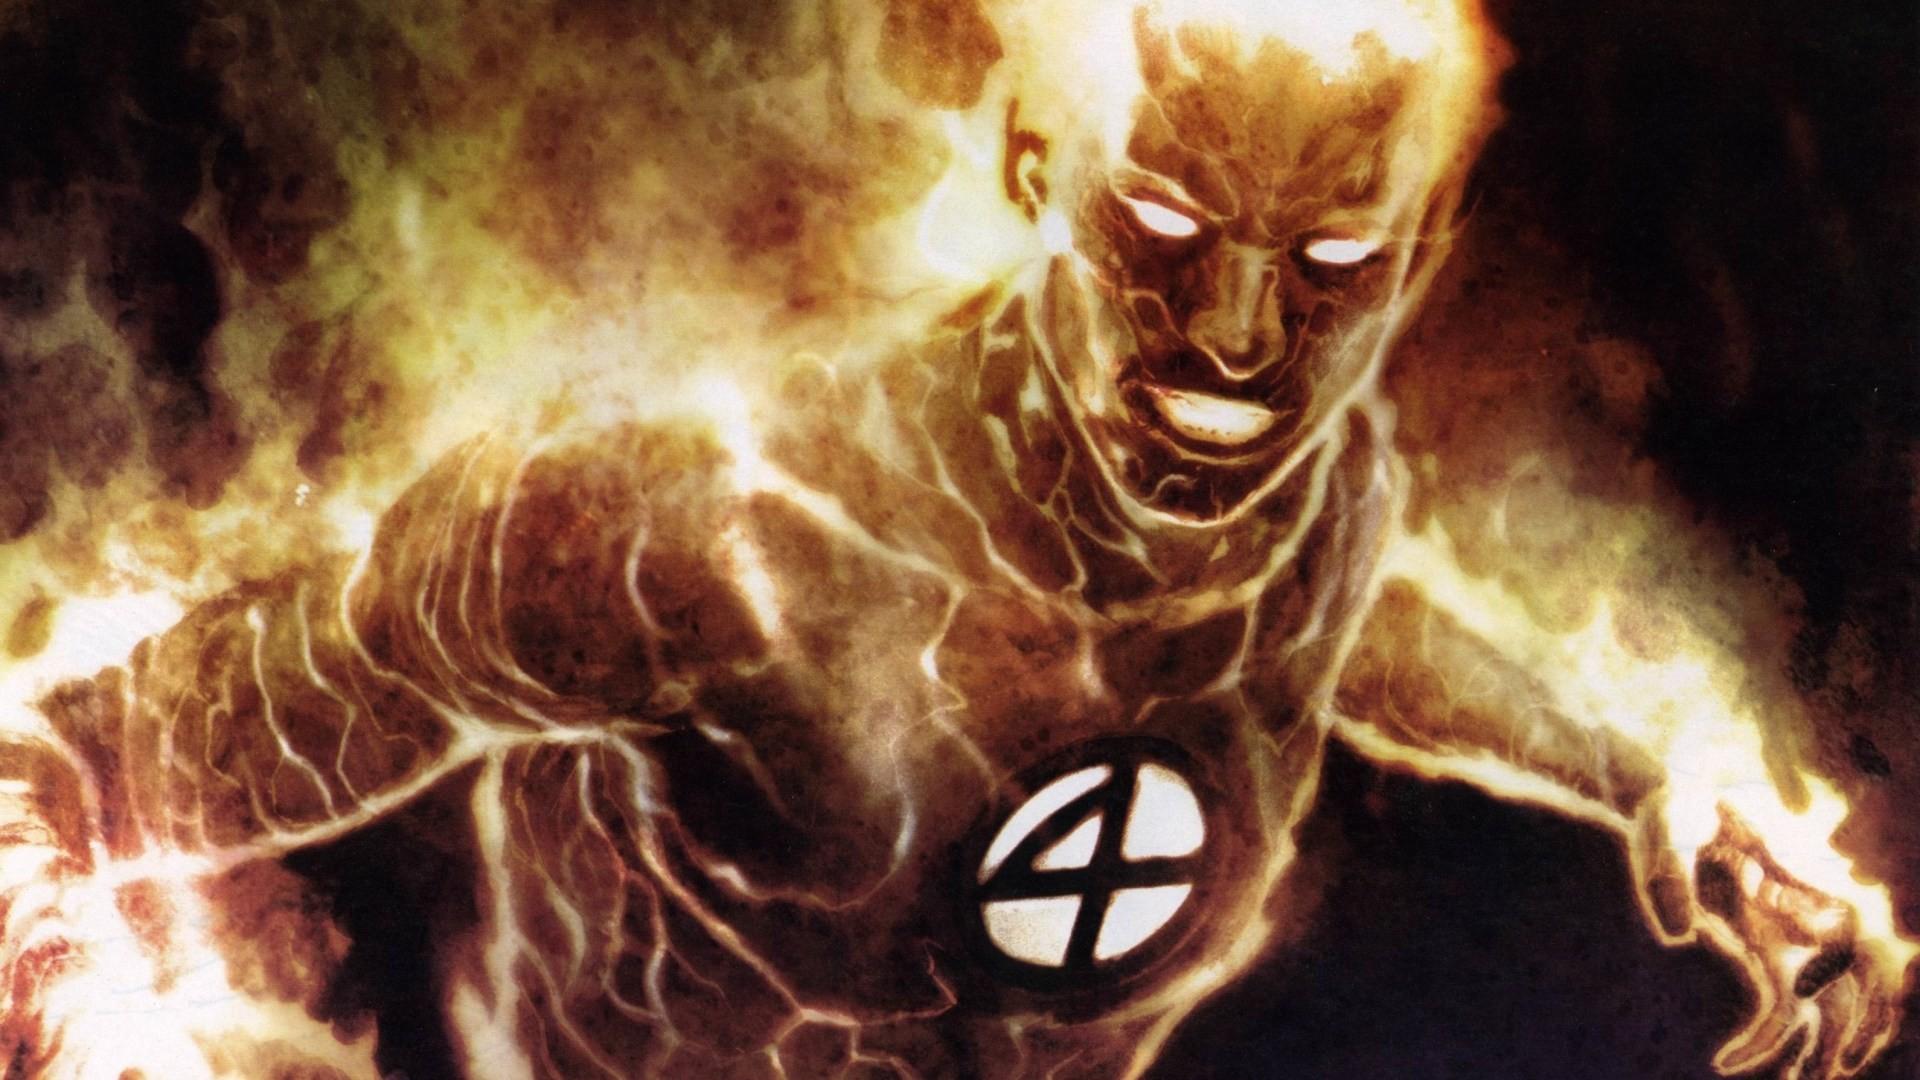 Res: 1920x1080, Superhero Marvel Human Torch (Johnny Storm) Fantastic Four 1080p HD  Wallpaper Background